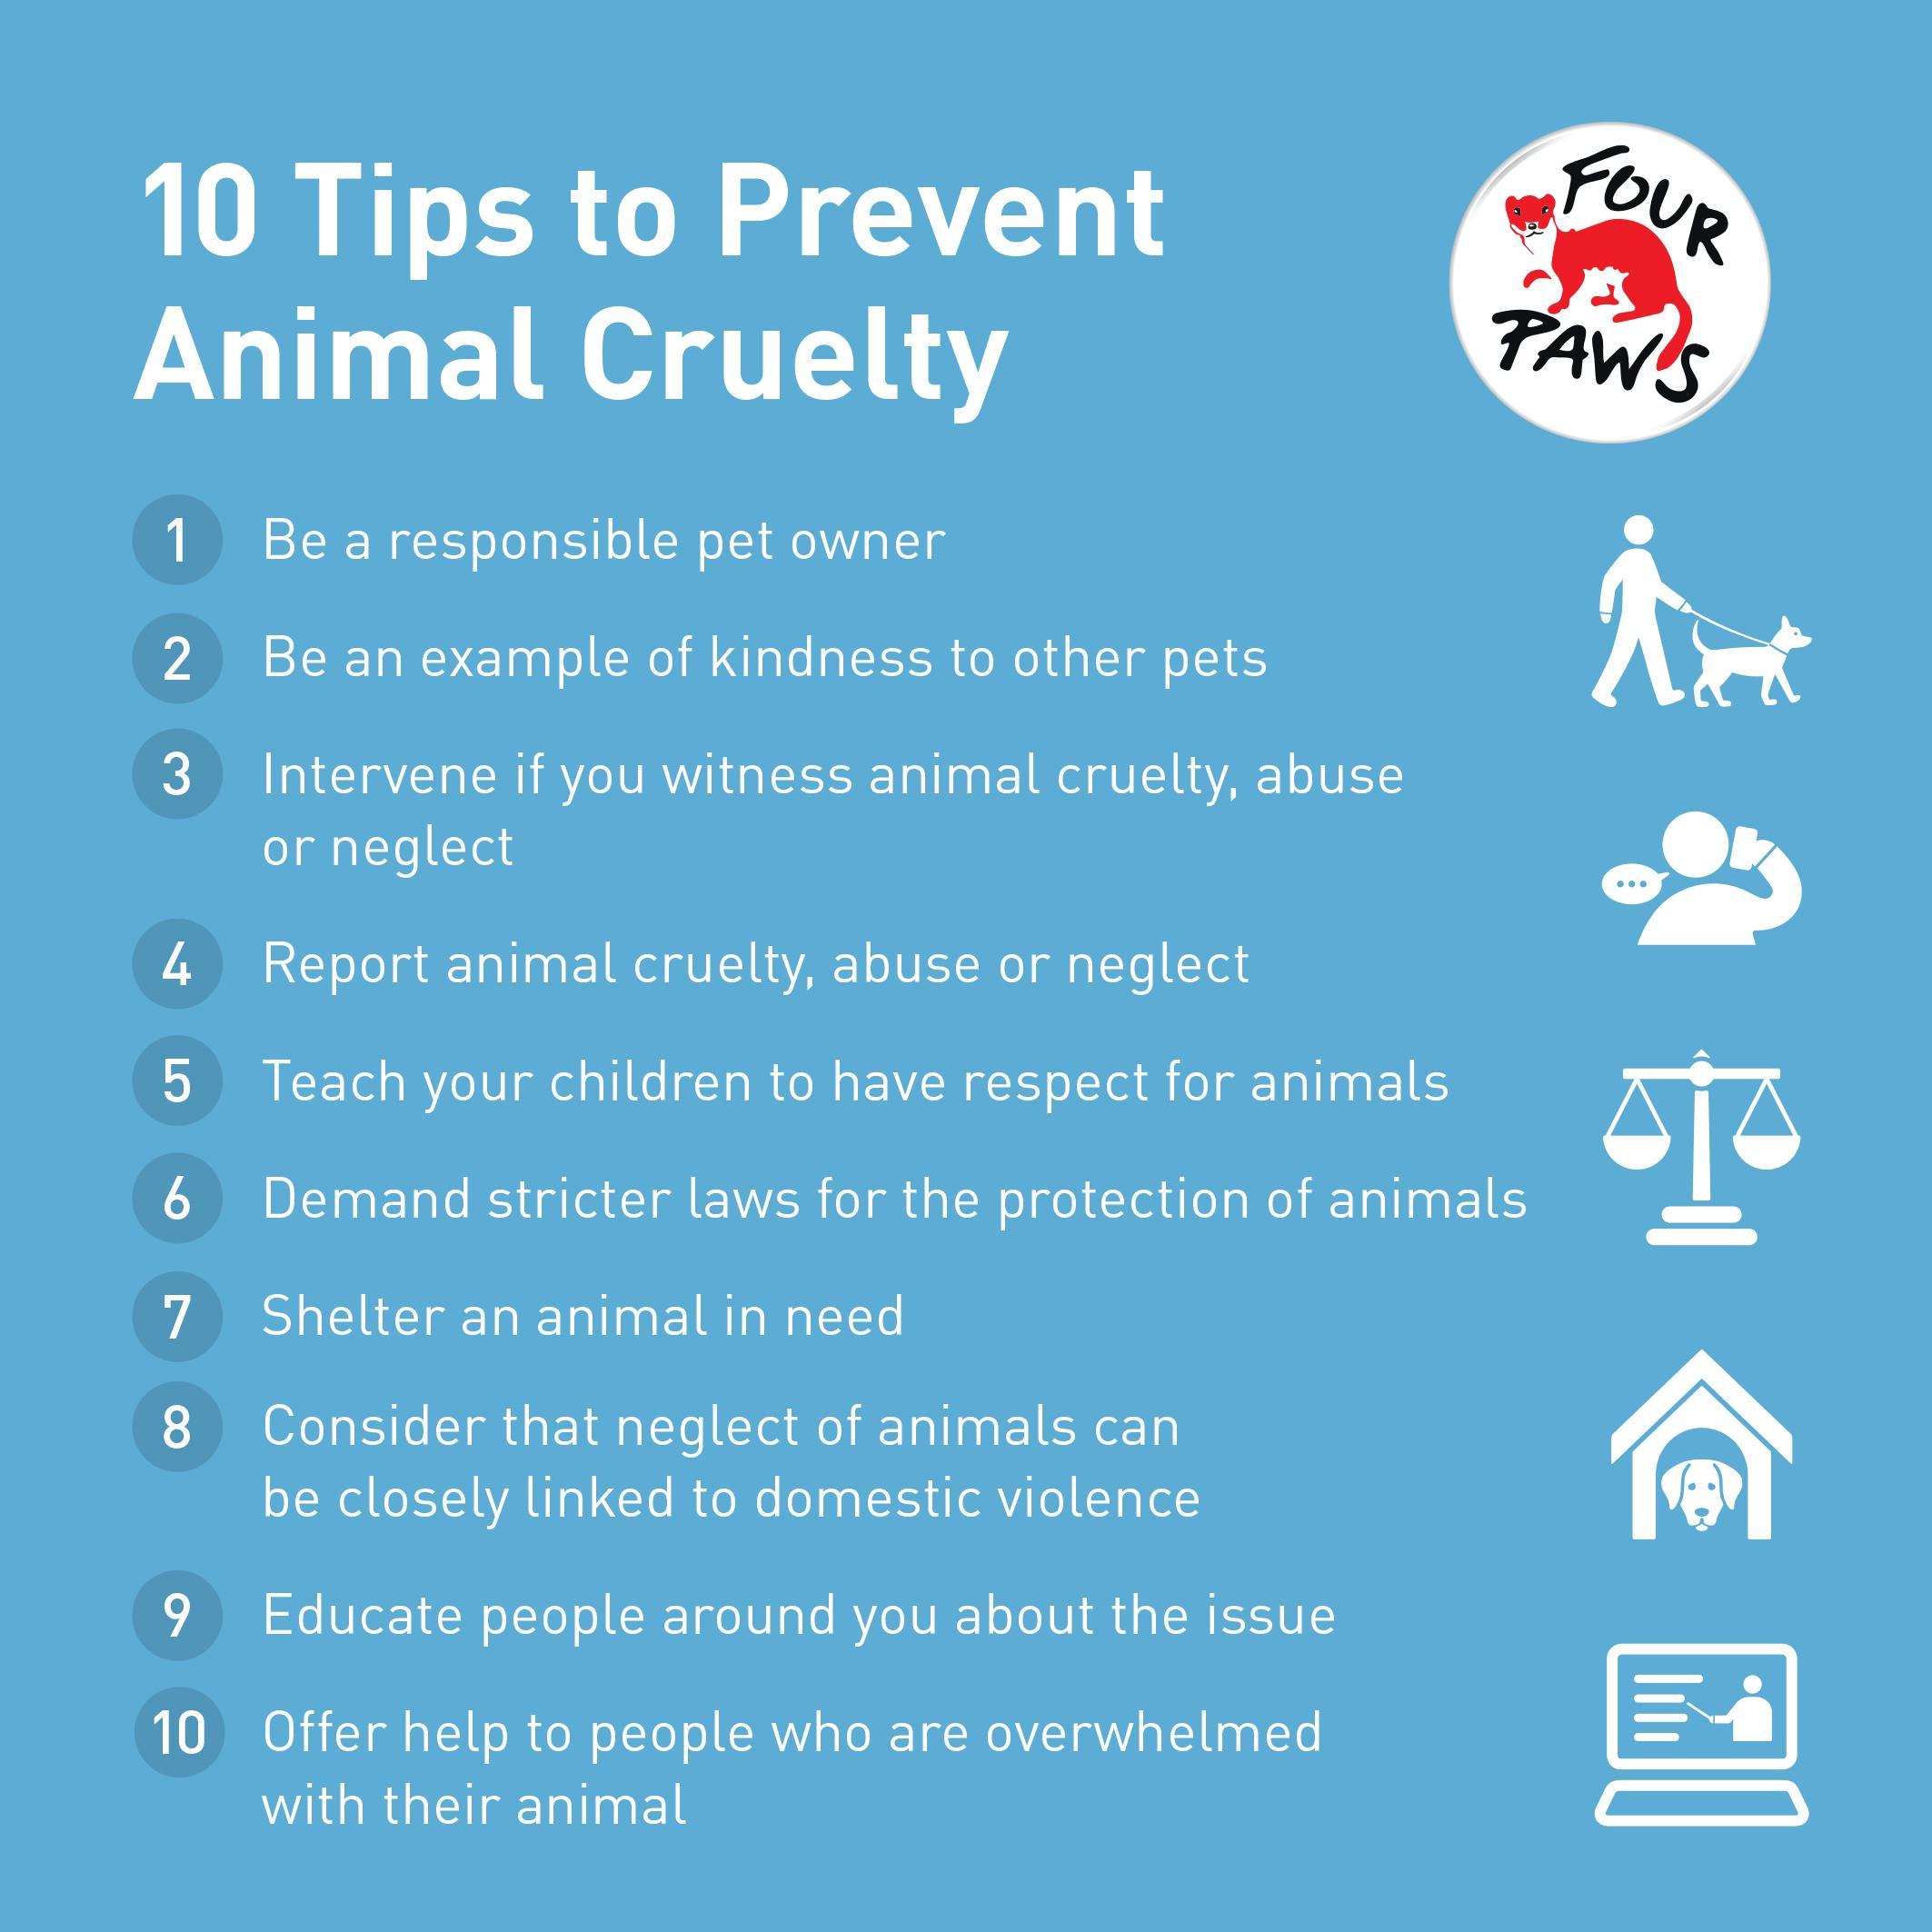 10 tips to prevent animal cruelty